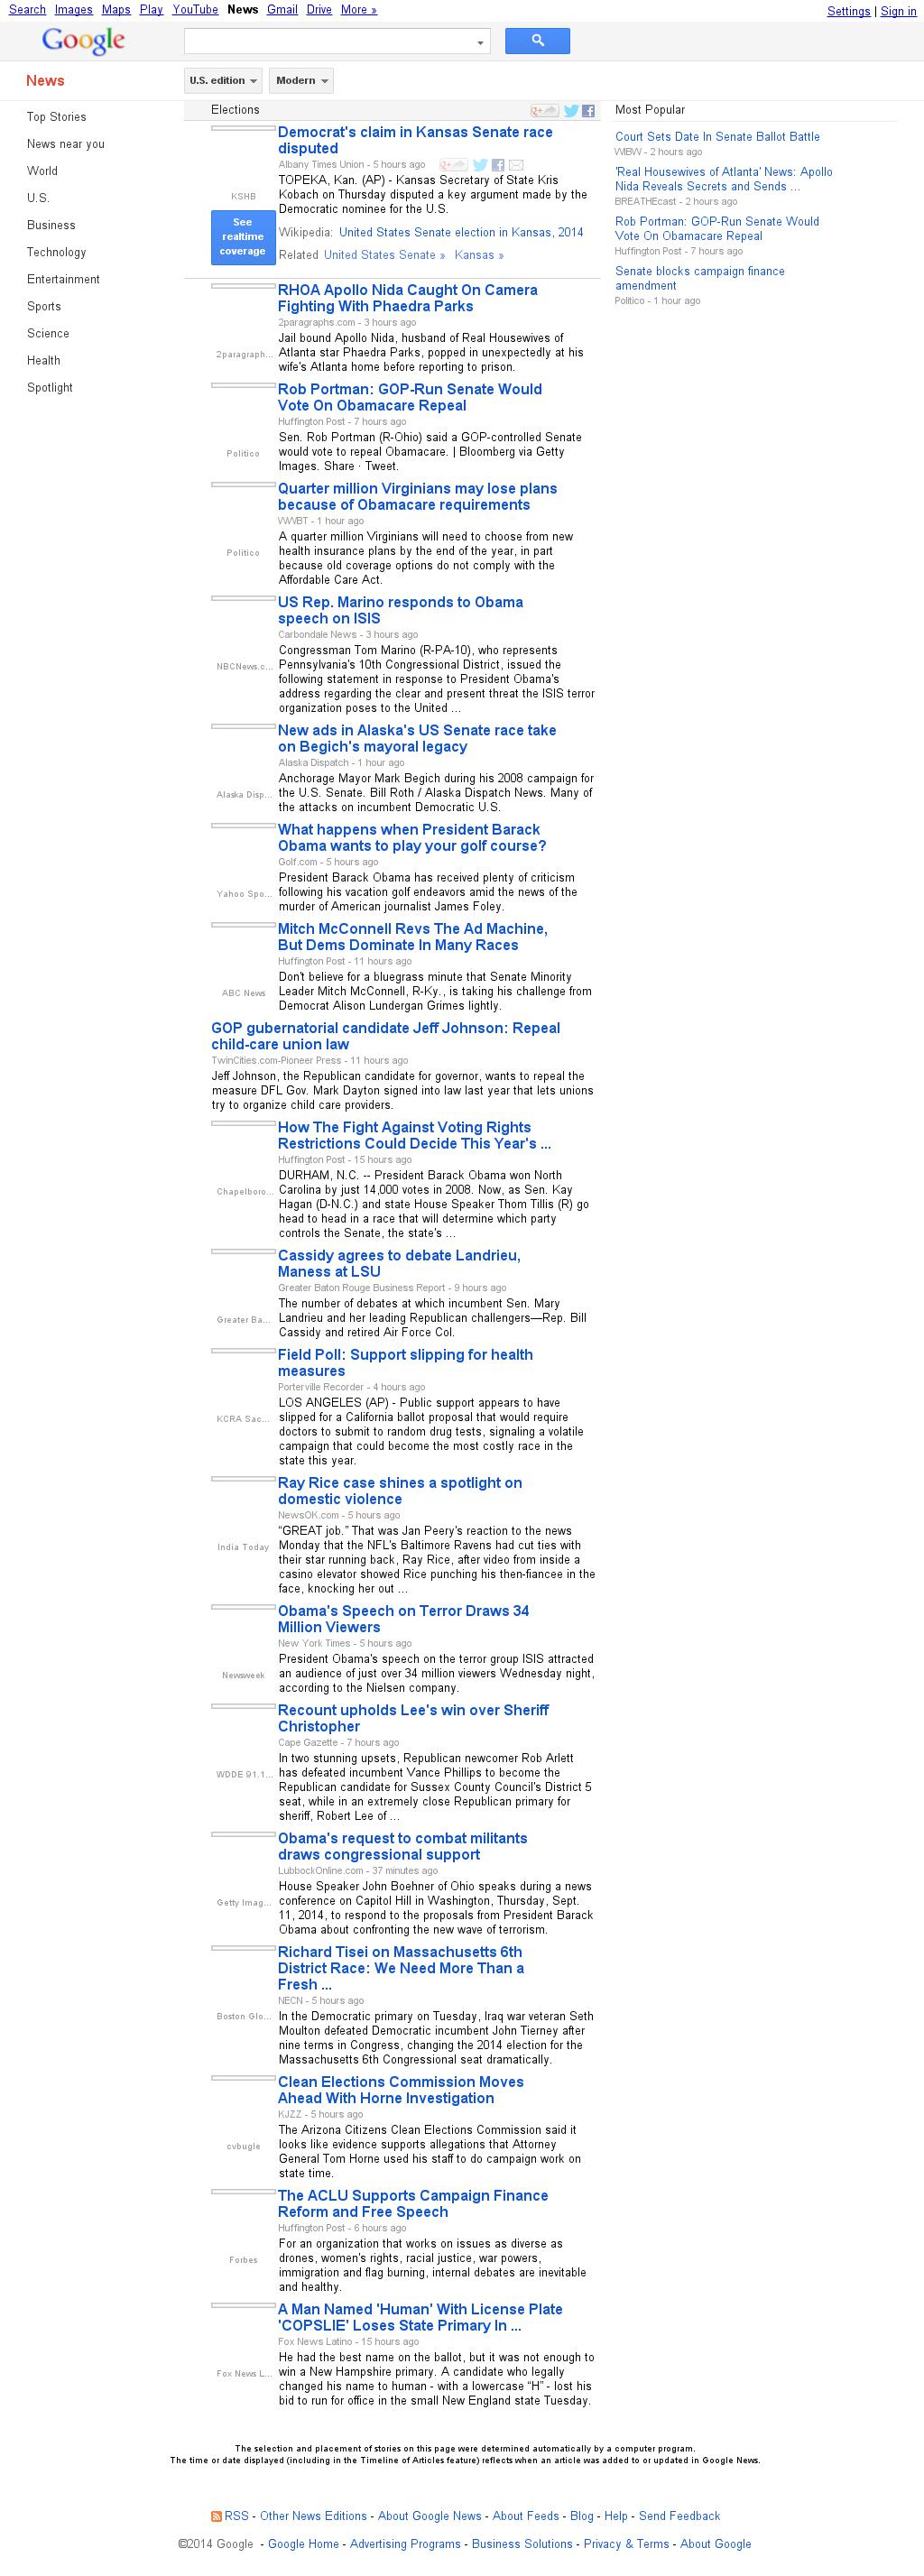 Google News: Elections at Friday Sept. 12, 2014, 6:07 a.m. UTC